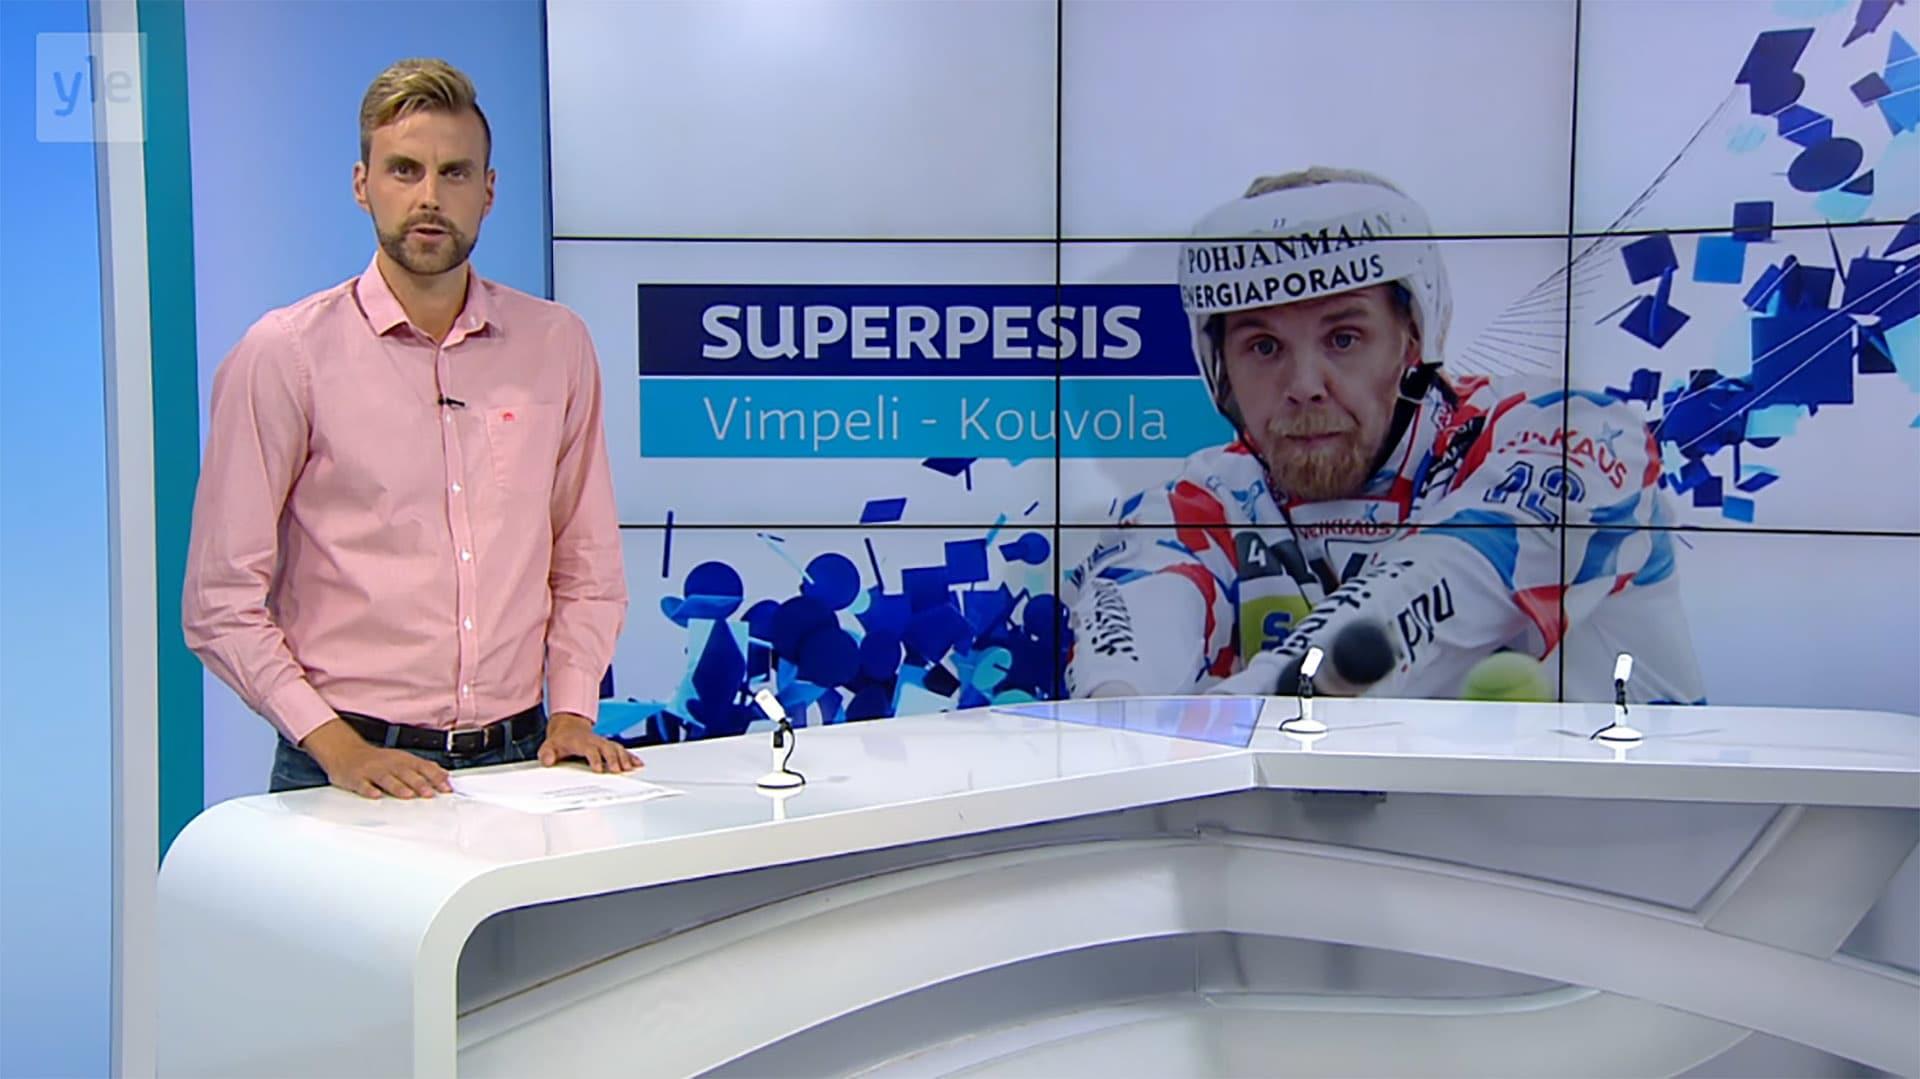 jääkiekko urheilu uutiset